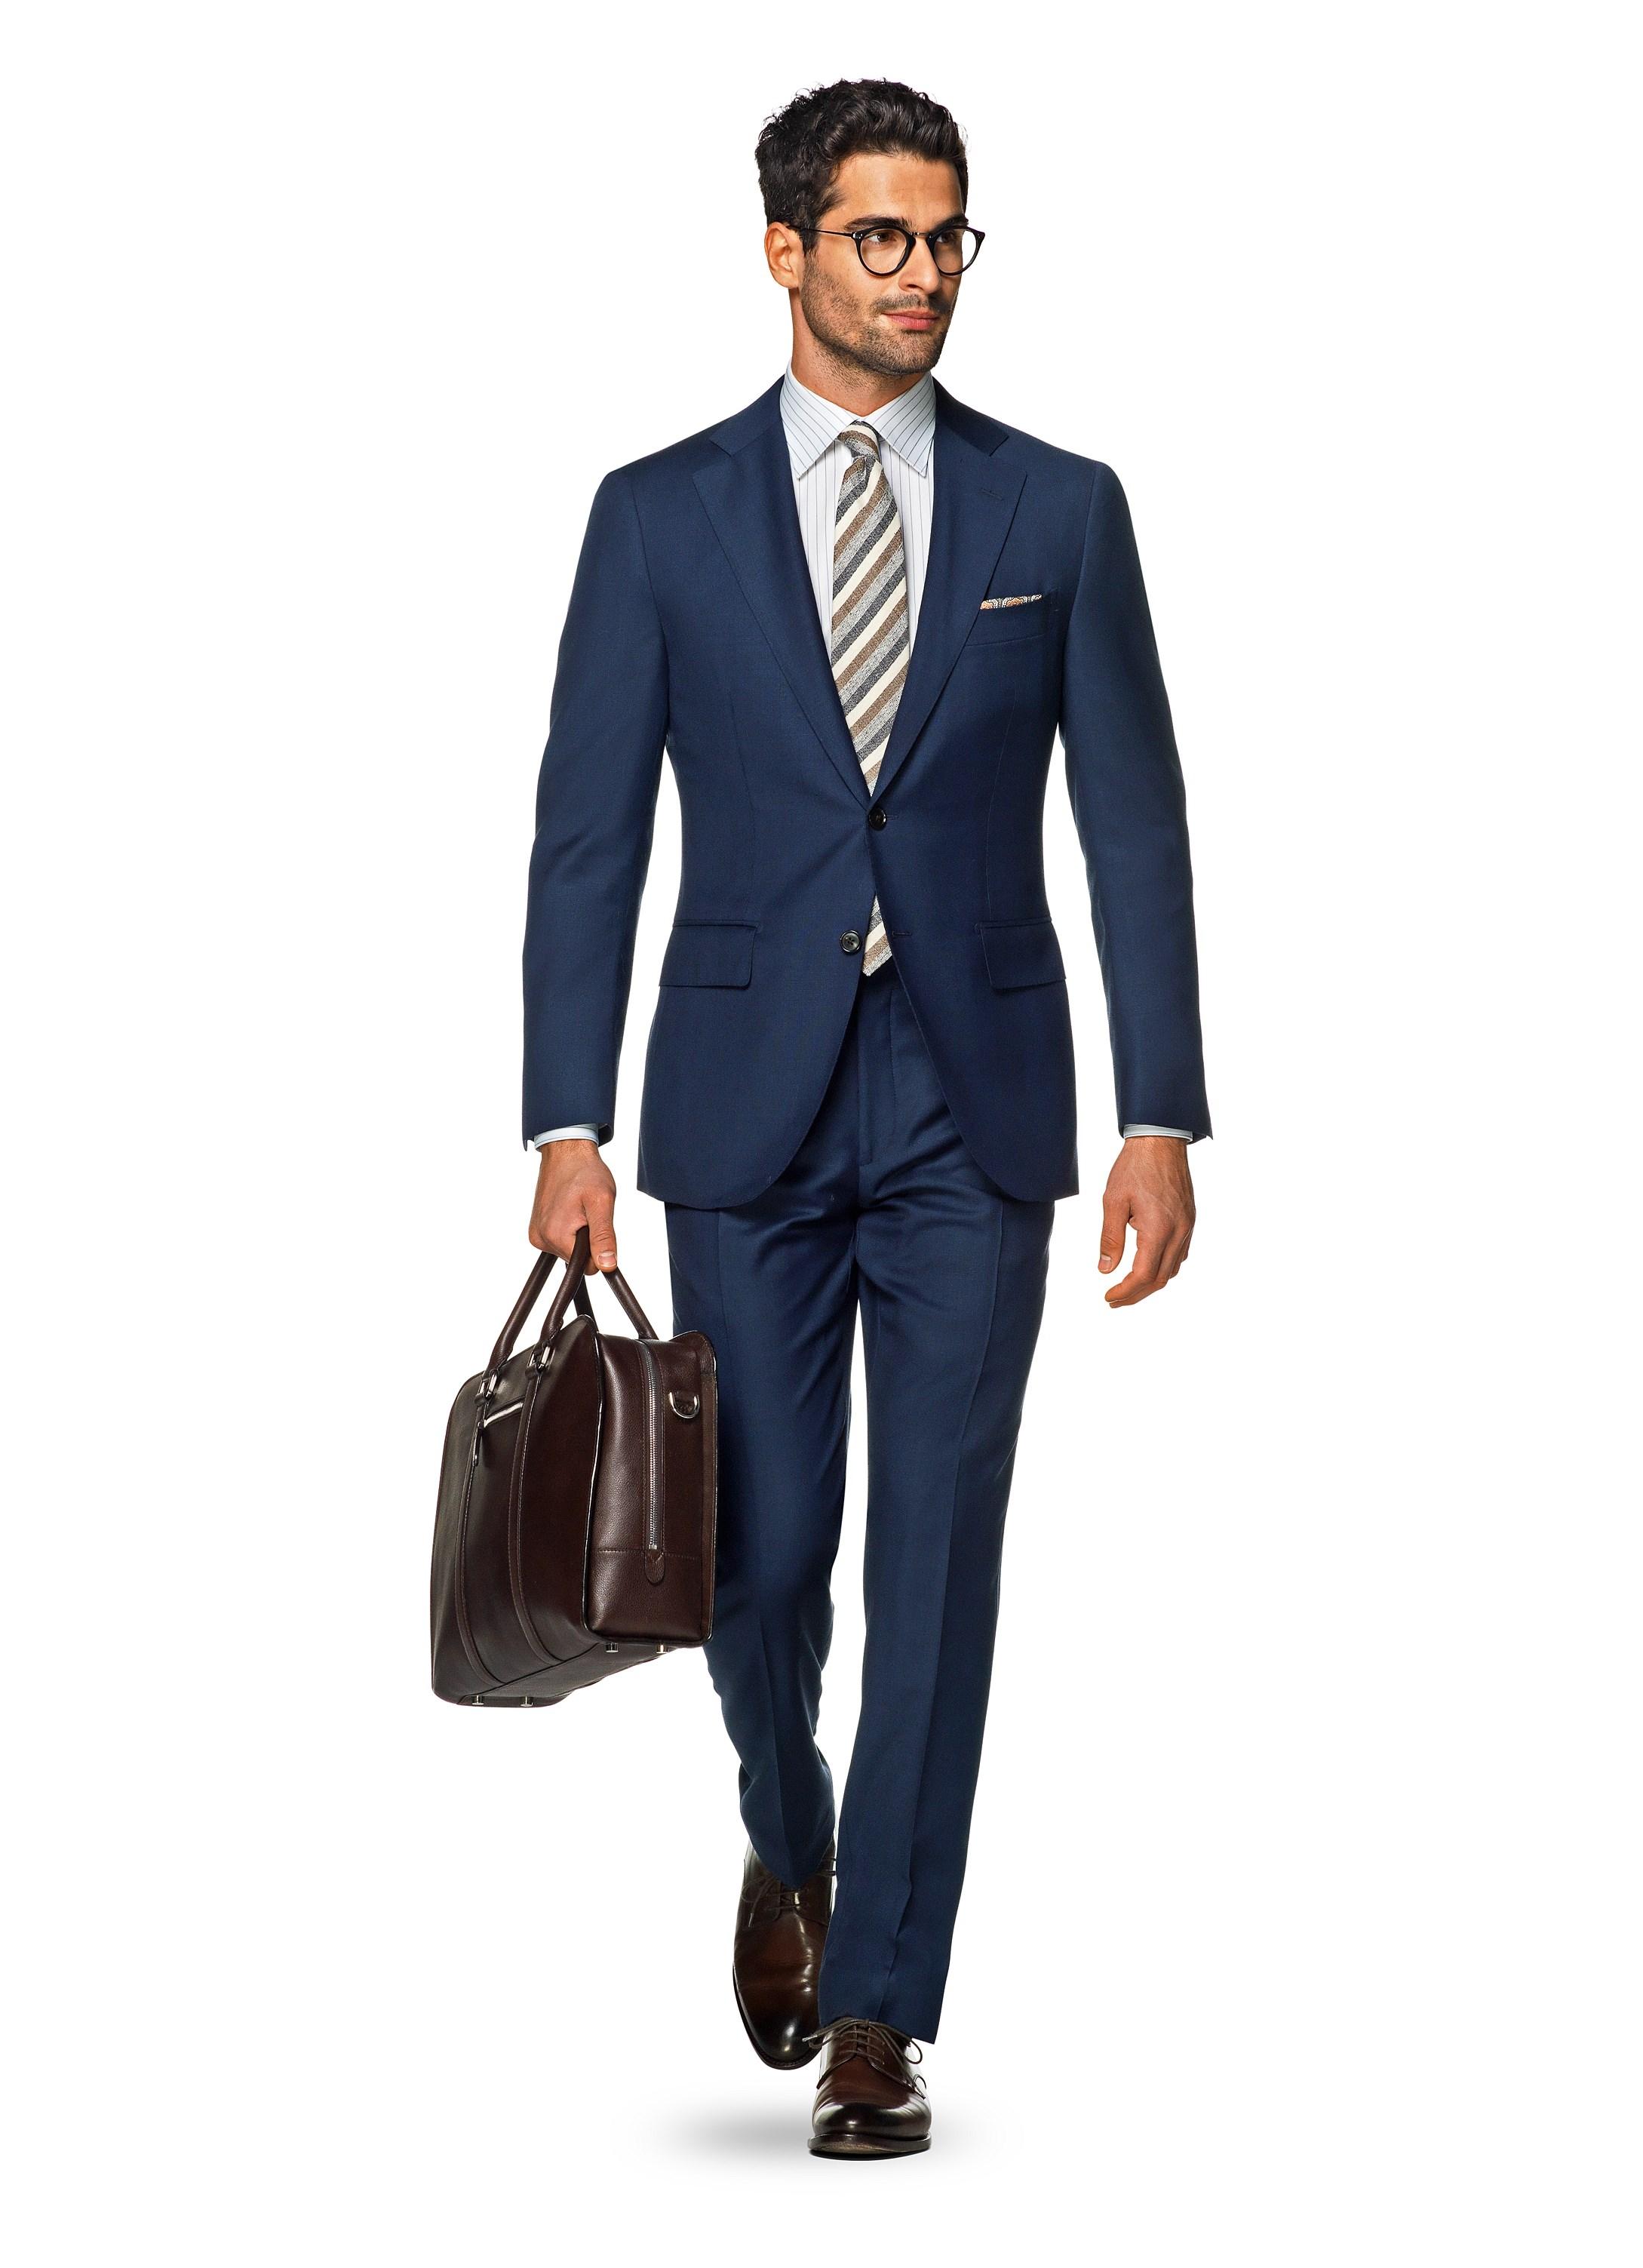 癹n��i*�i��l.�la:)�h�_suit_navy_check_la_spalla_p4222i